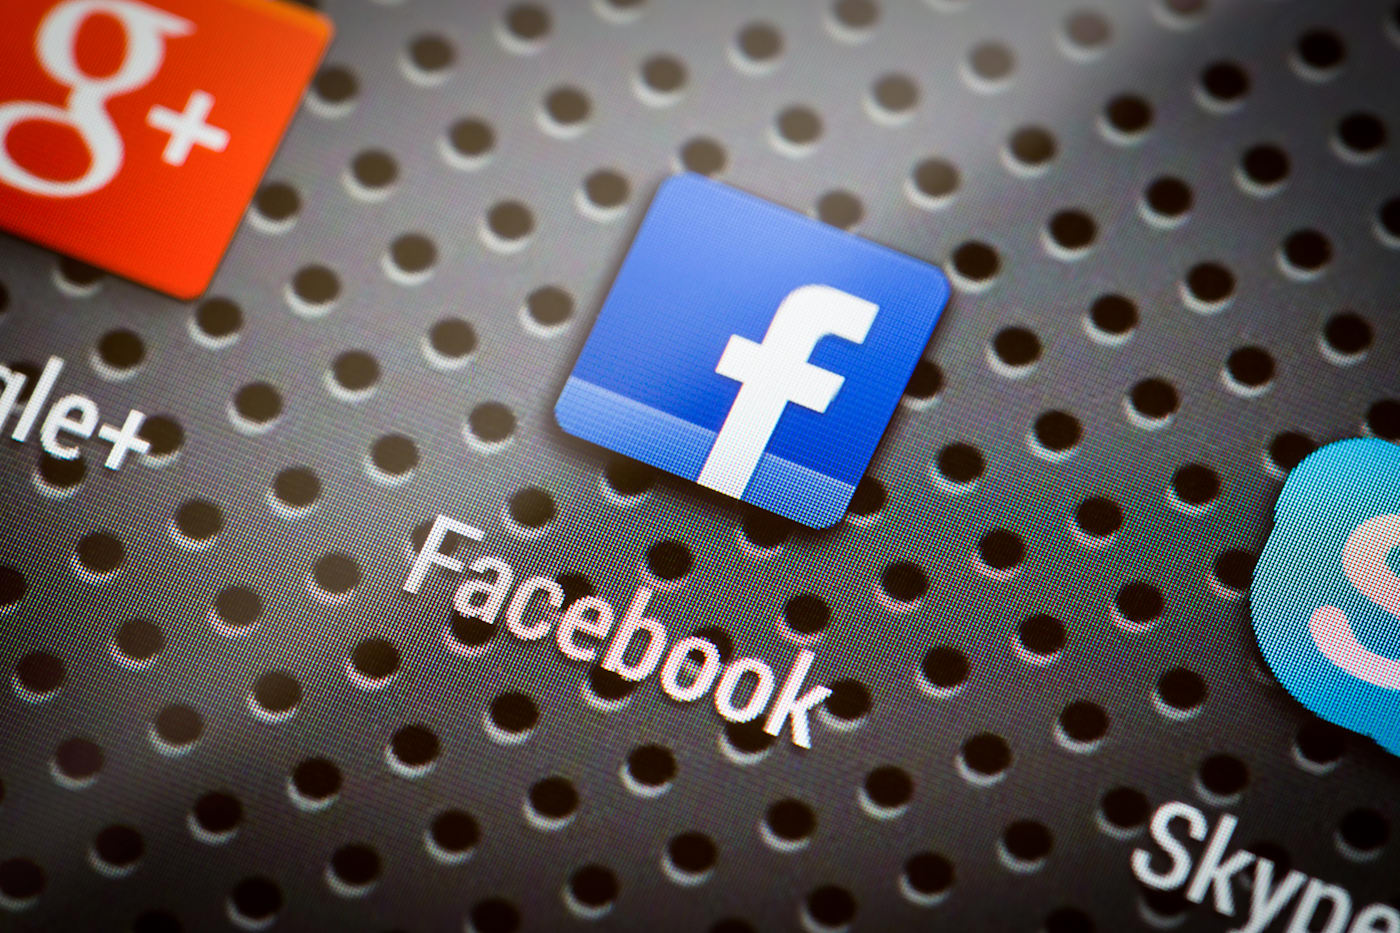 BELCHATOW, POLAND - APRIL 10, 2014: Closeup photo of Facebook icon on mobile phone screen. Popular social network.